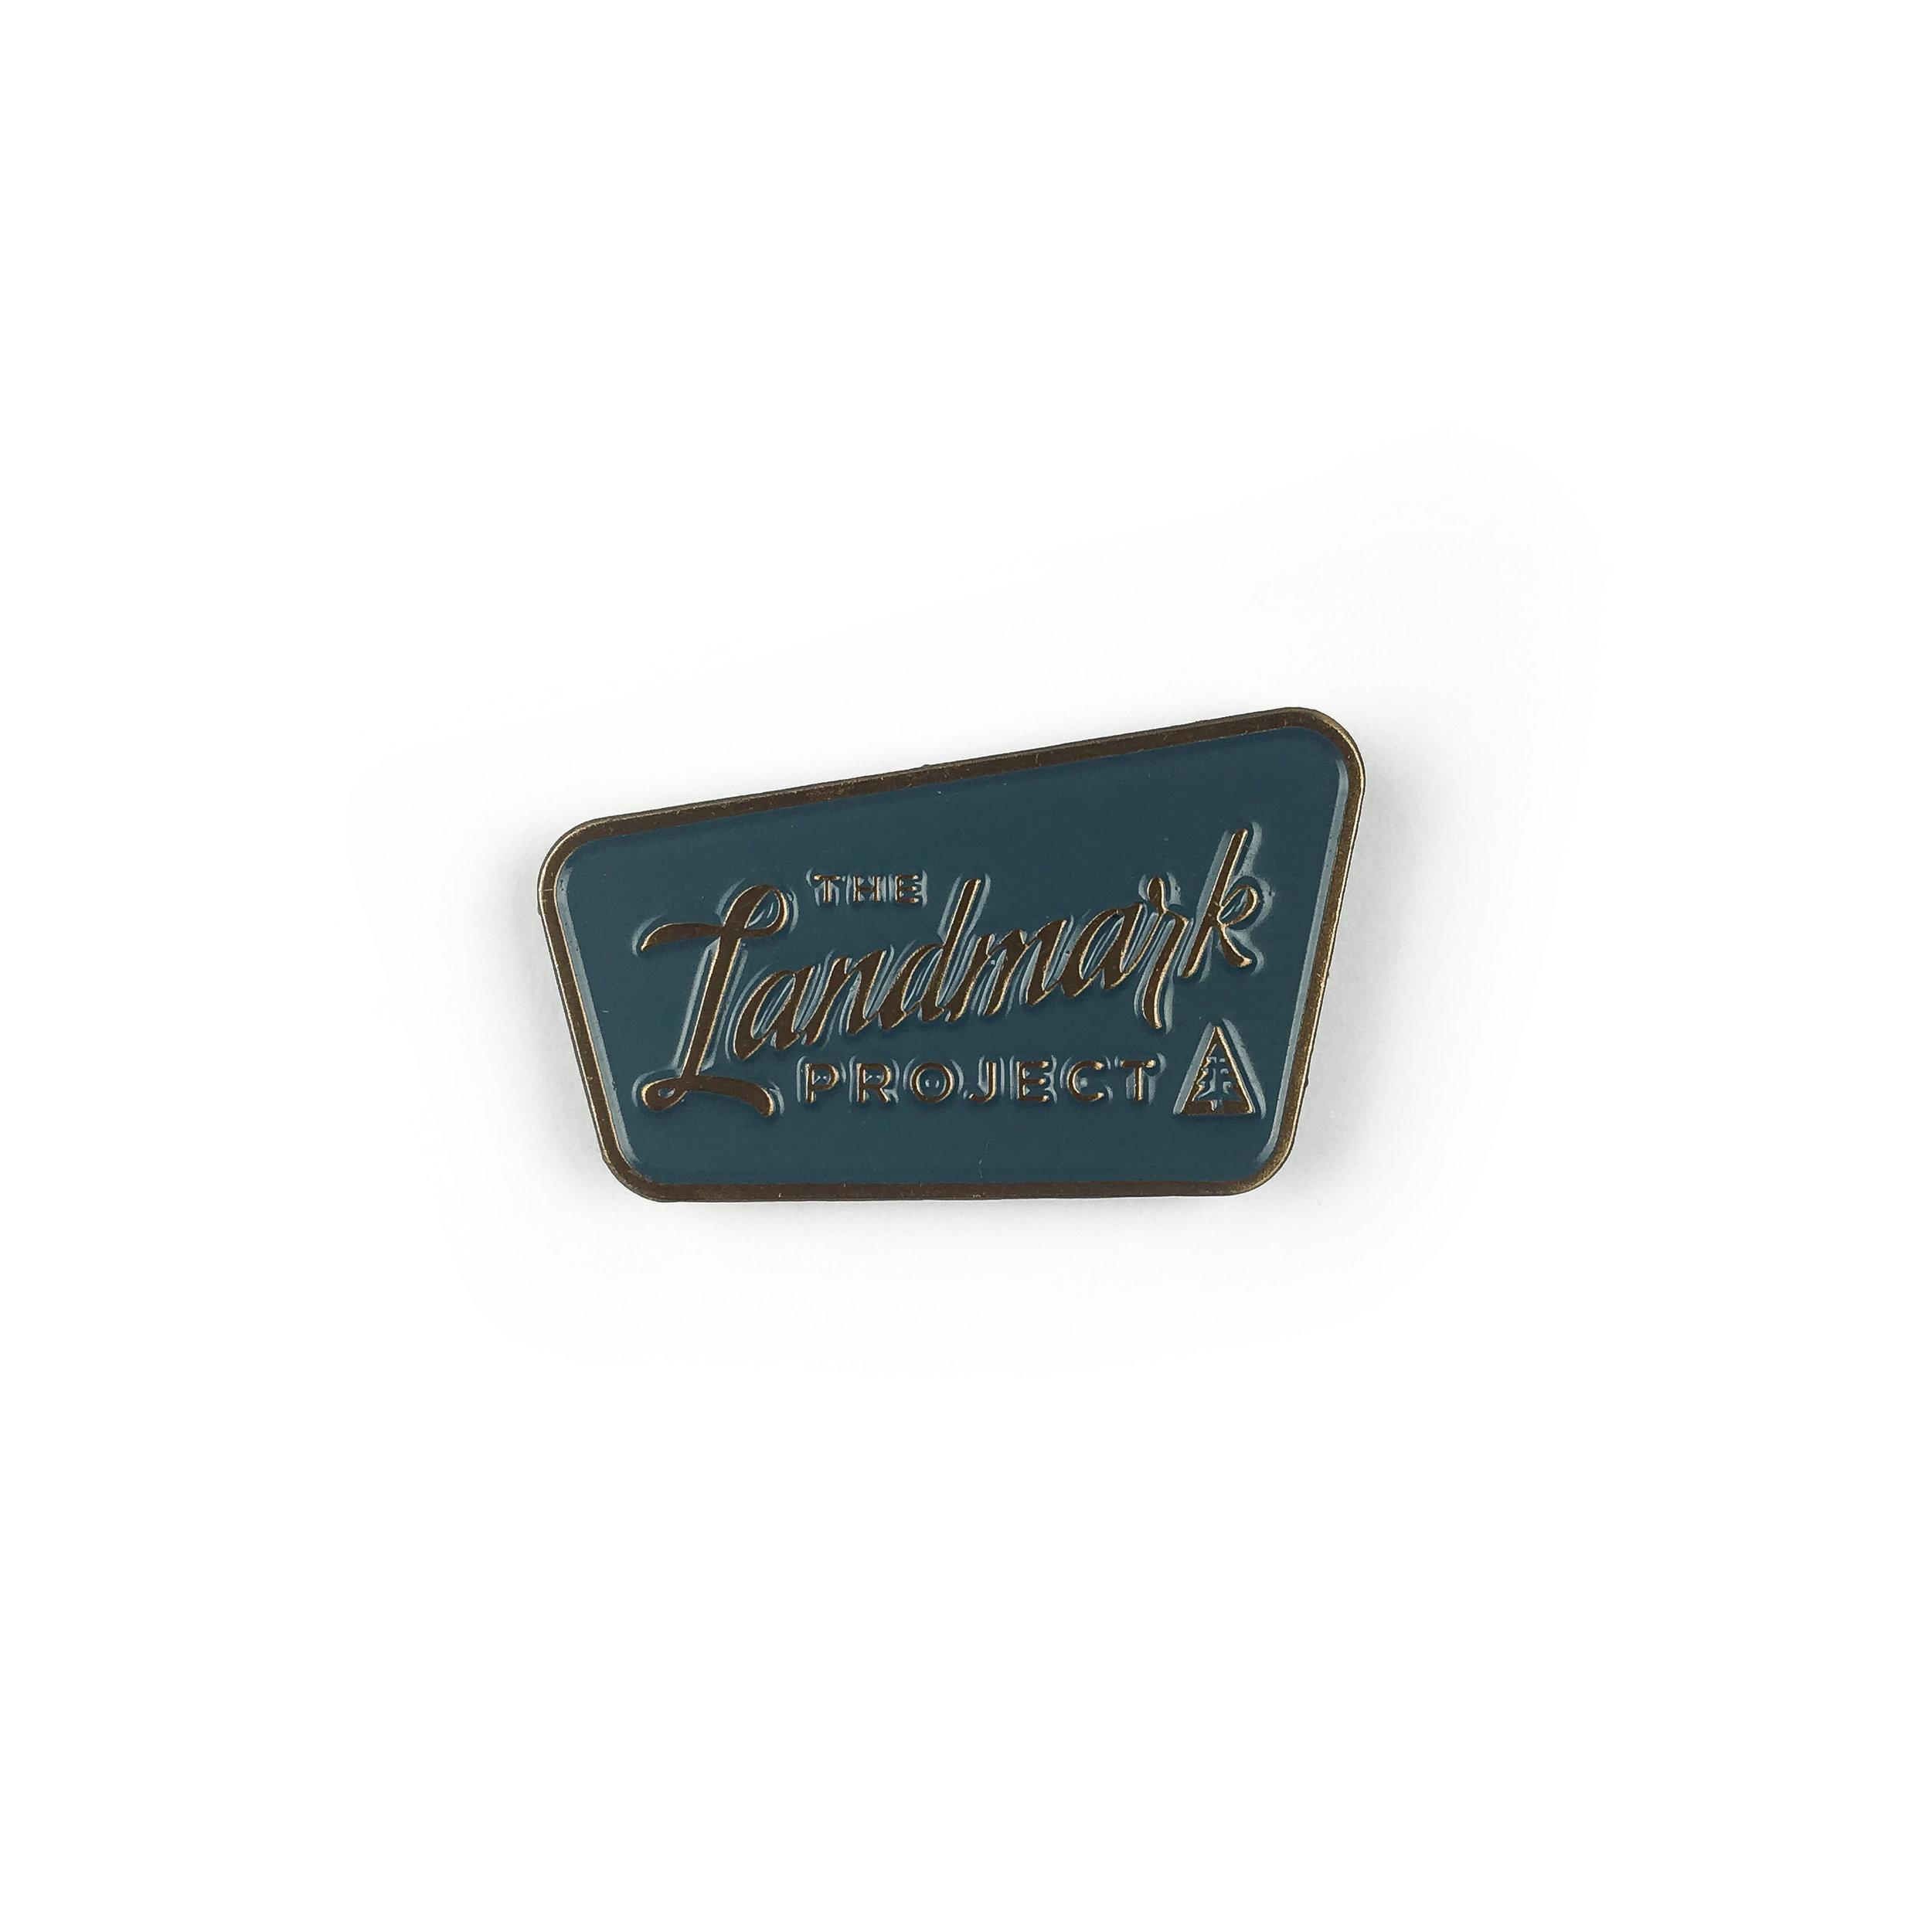 new pins-02.jpg